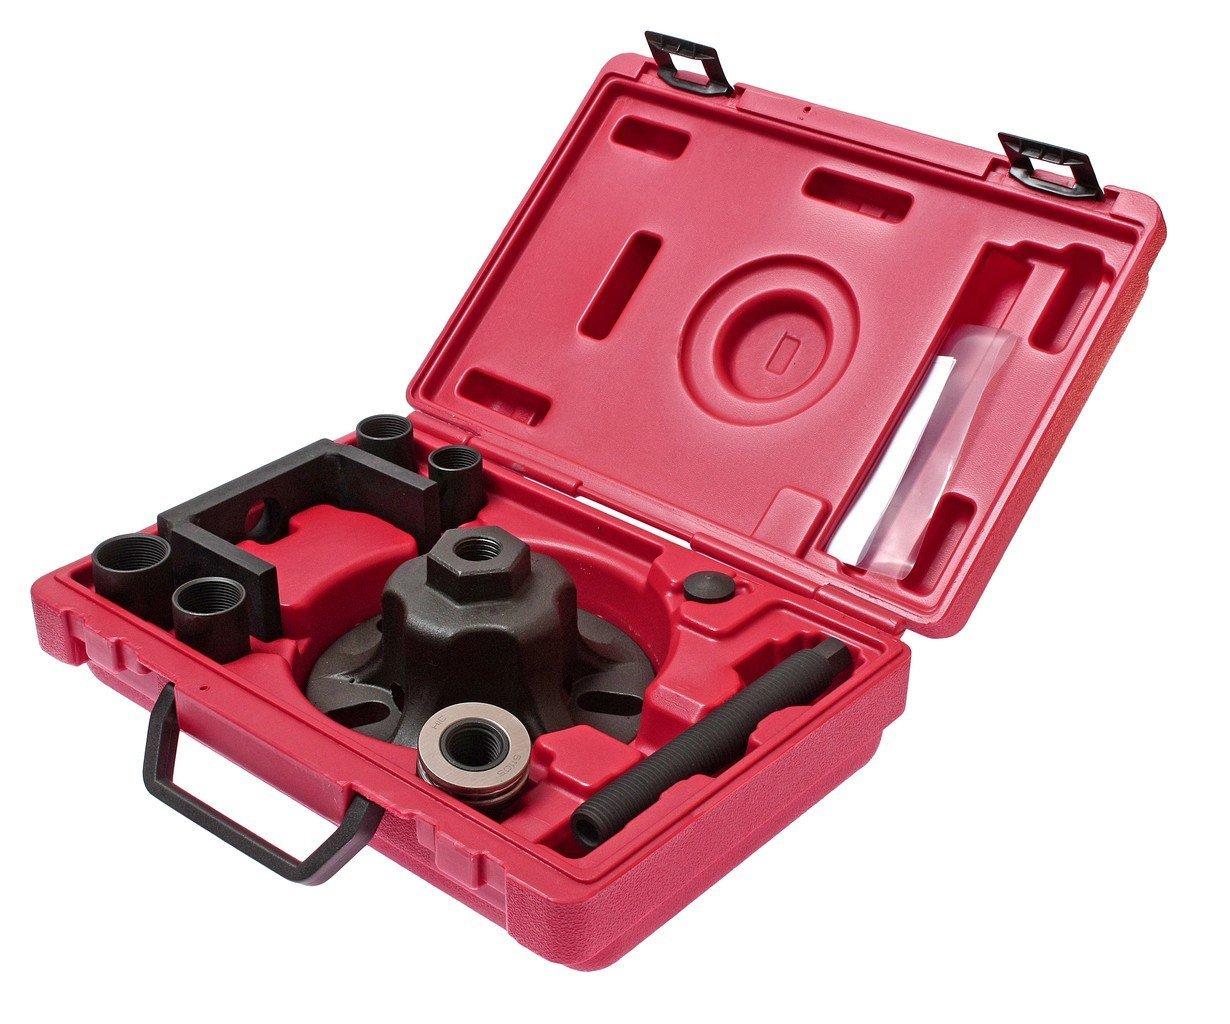 JTC-4873 Съемник ступицы с адаптерами М22х1.5, М24х1.5, М27х1.5, М30х1.5